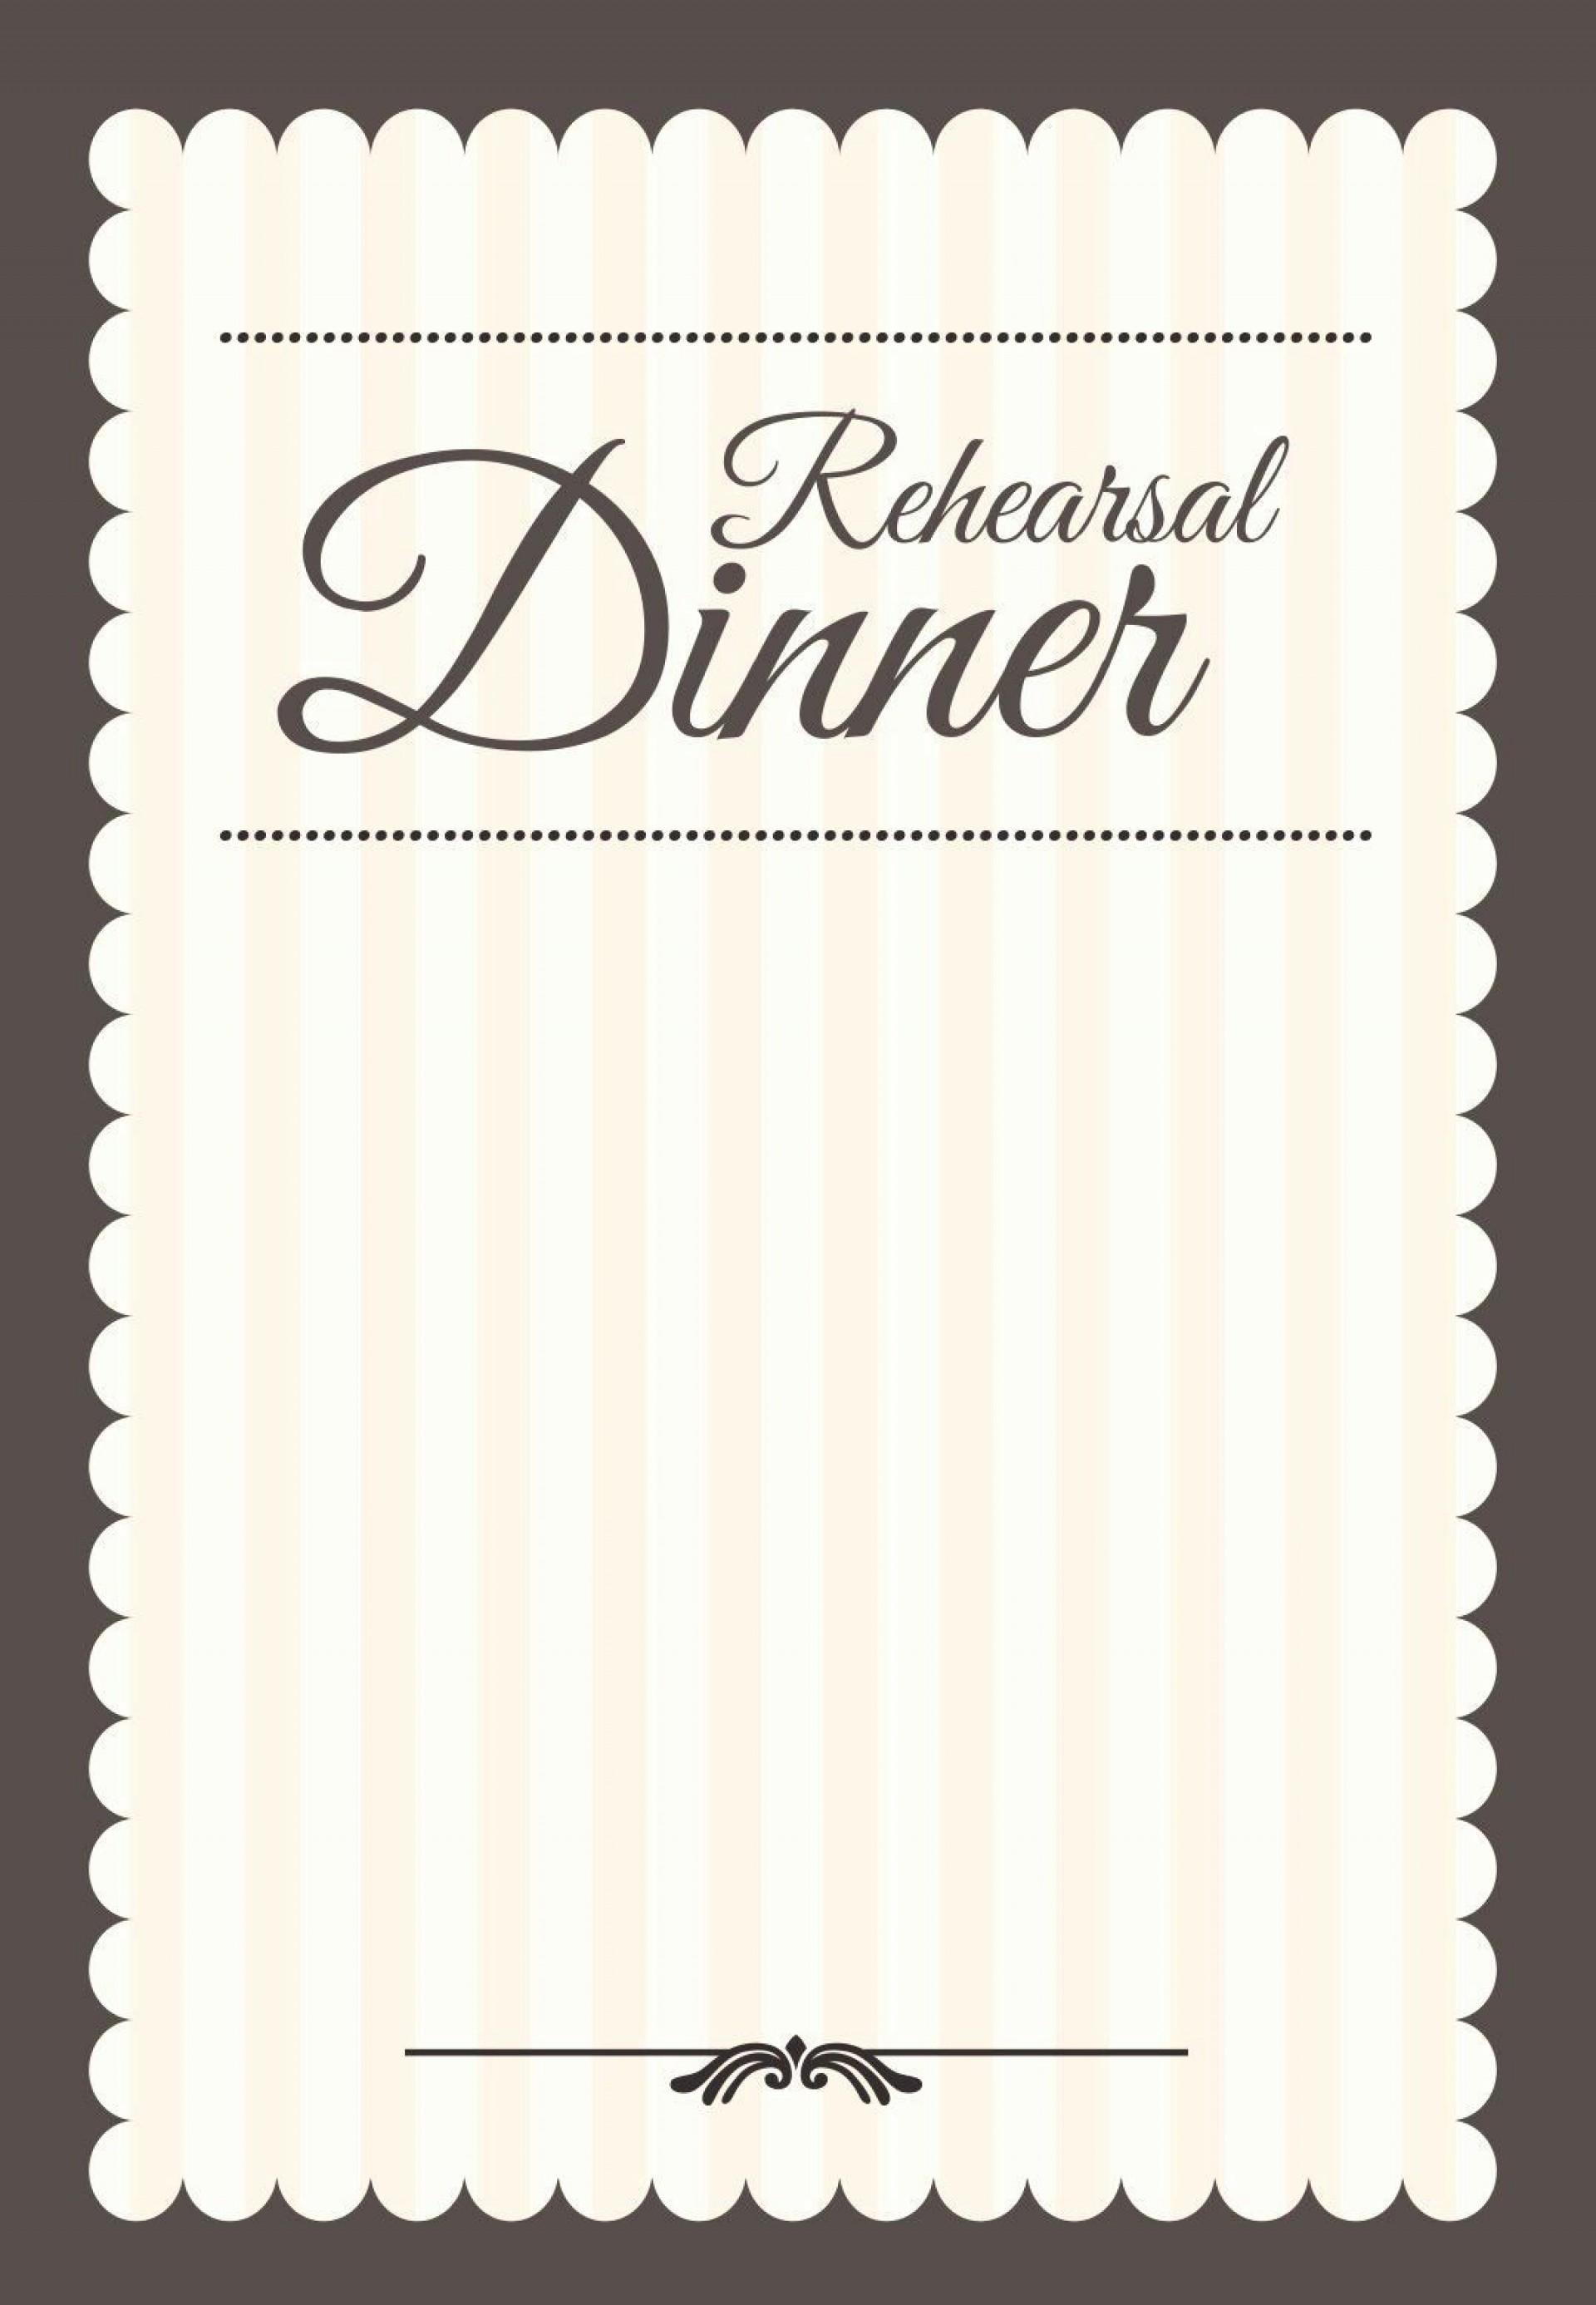 006 Singular Free Dinner Invitation Template High Resolution  Templates Rehearsal Printable Italian Thanksgiving1920